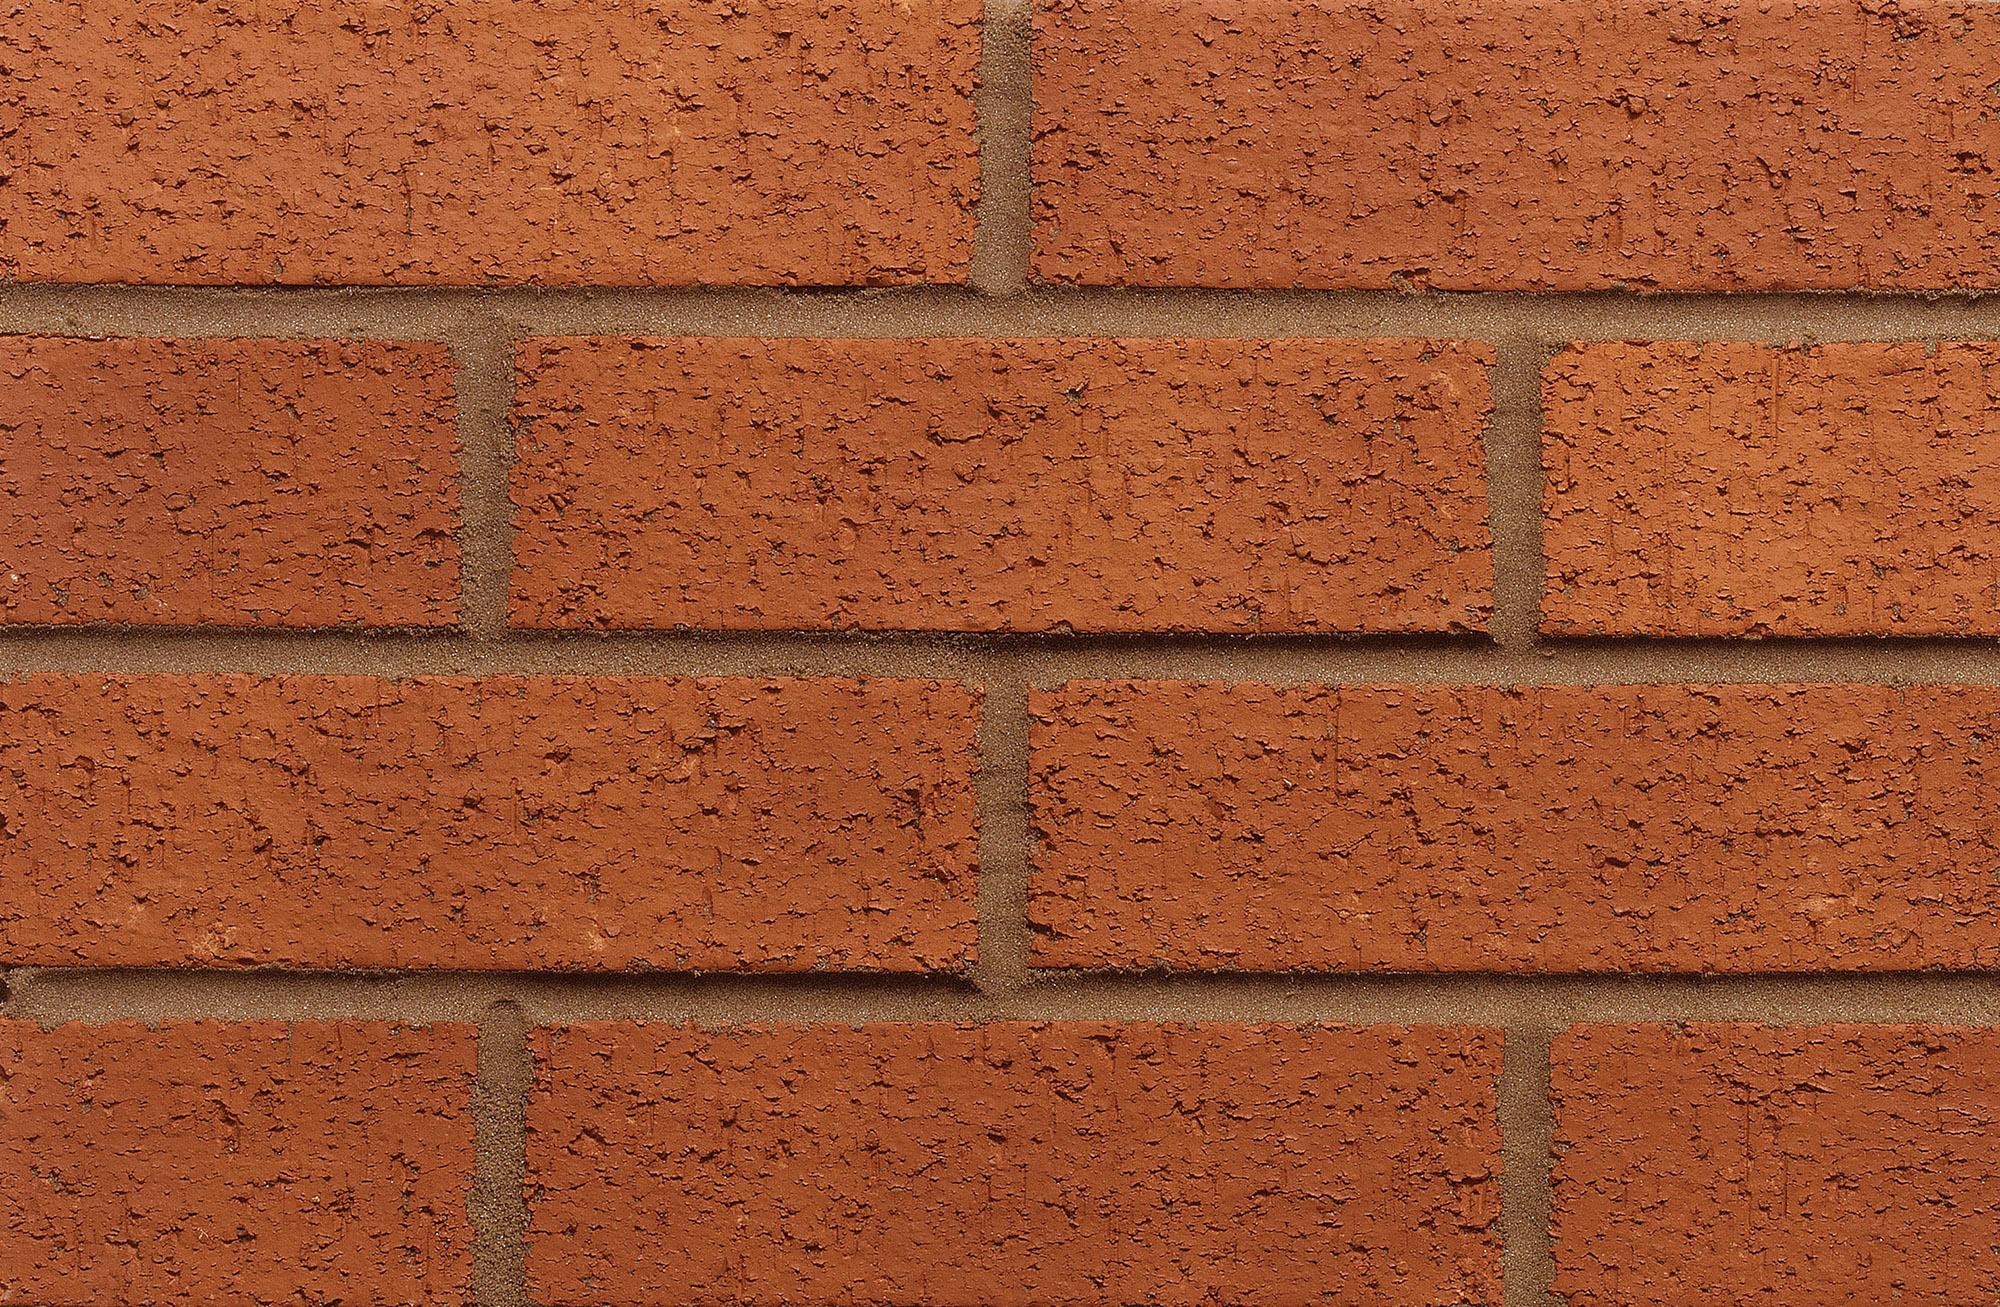 Images of Brick | 2000x1307